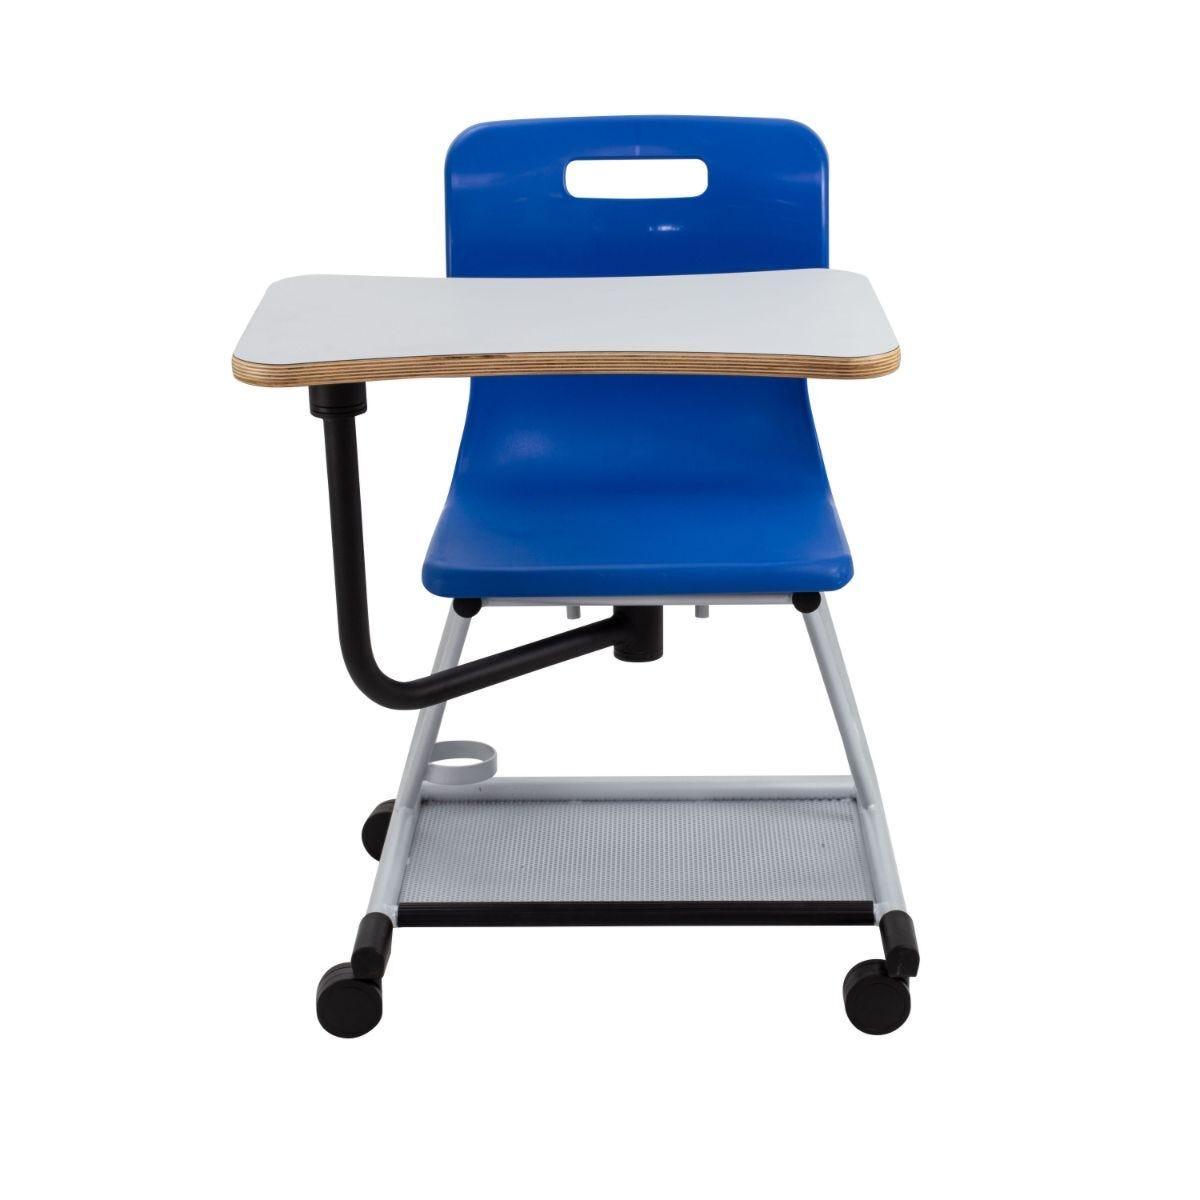 TC Office Titan Teach Chair with Writing Tablet Blue